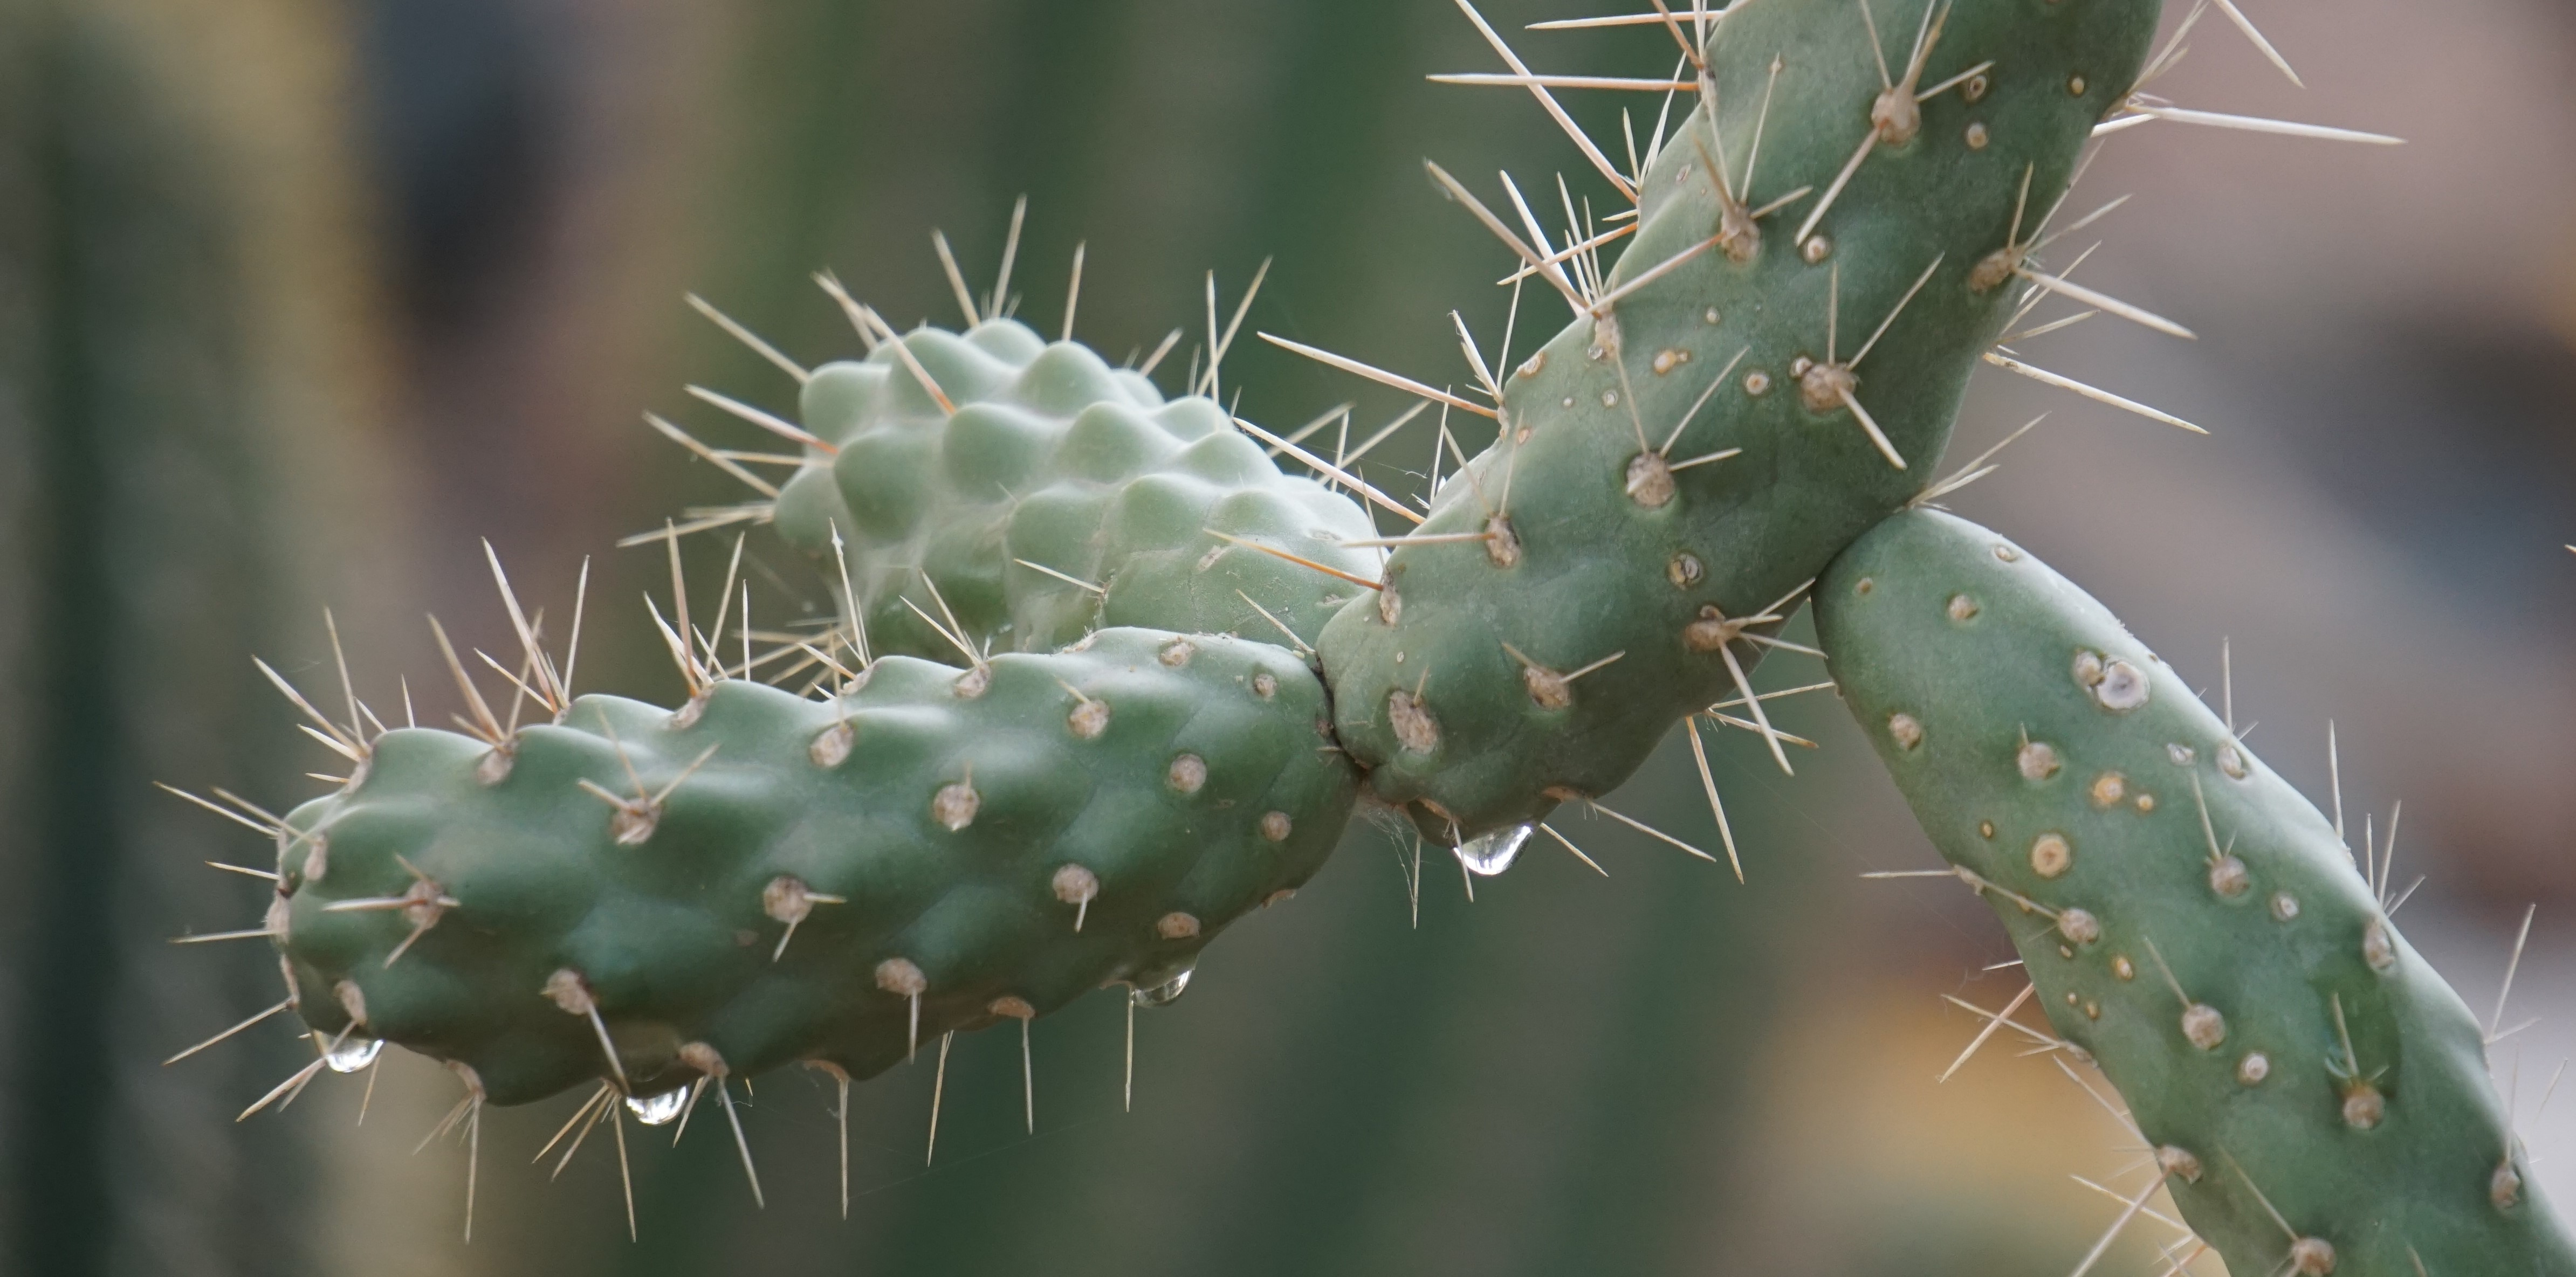 Dripping Cactus_042415